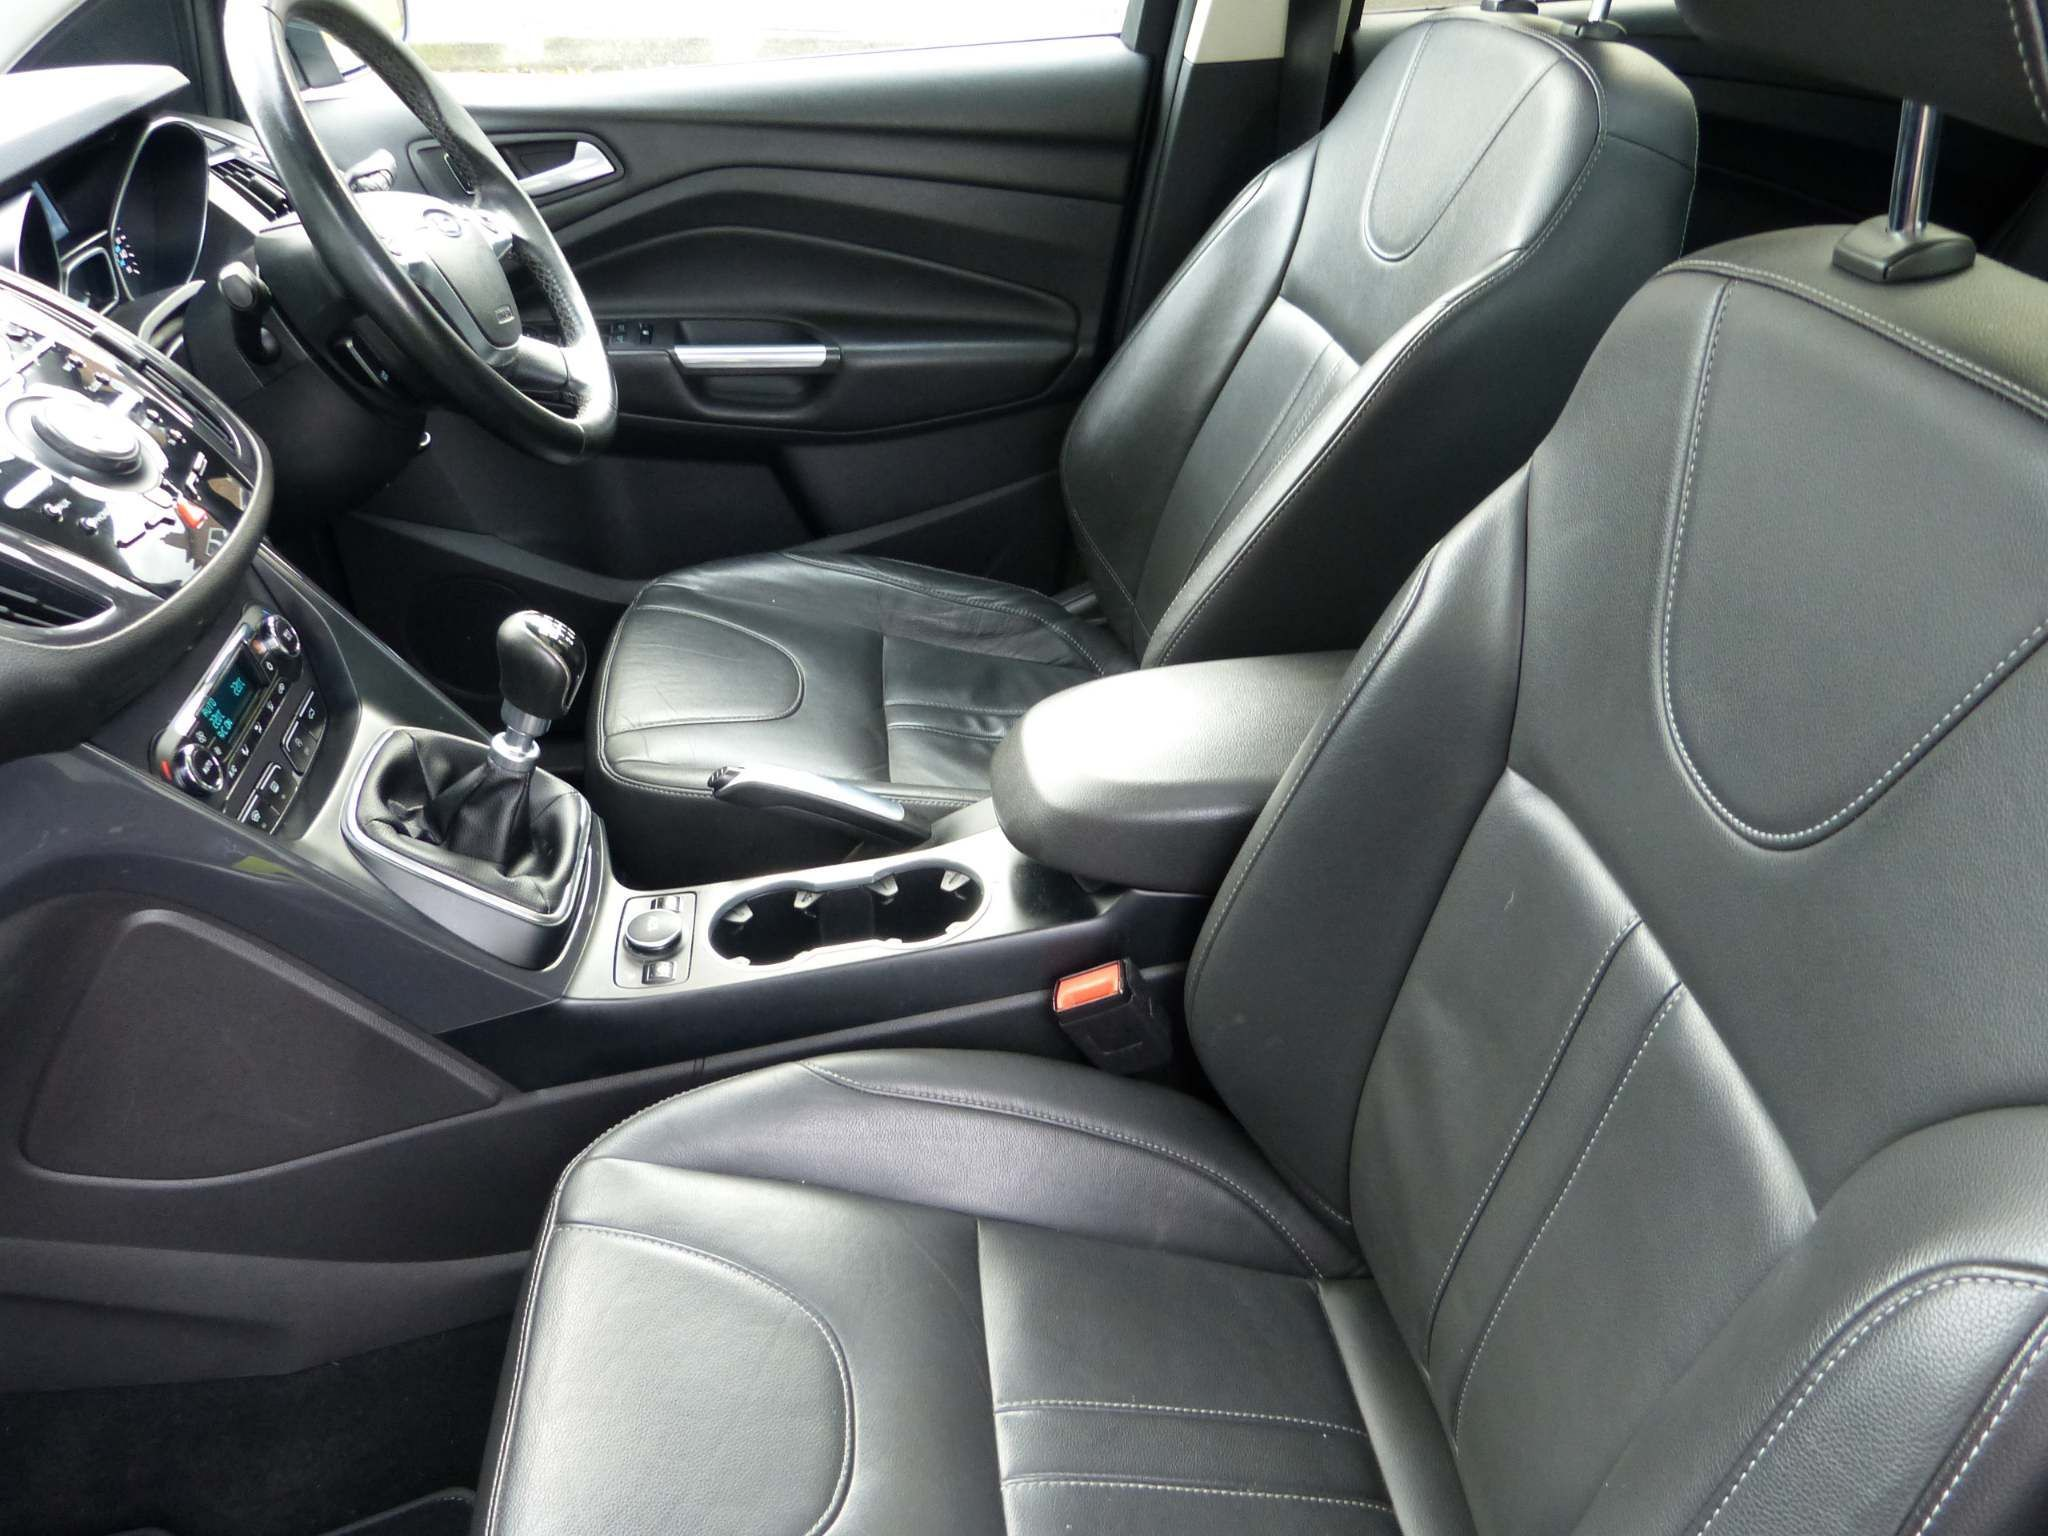 2015 FORD Kuga 2.0 TDCi Titanium X Diesel Manual full leather – Beechlawn Motors Belfast full